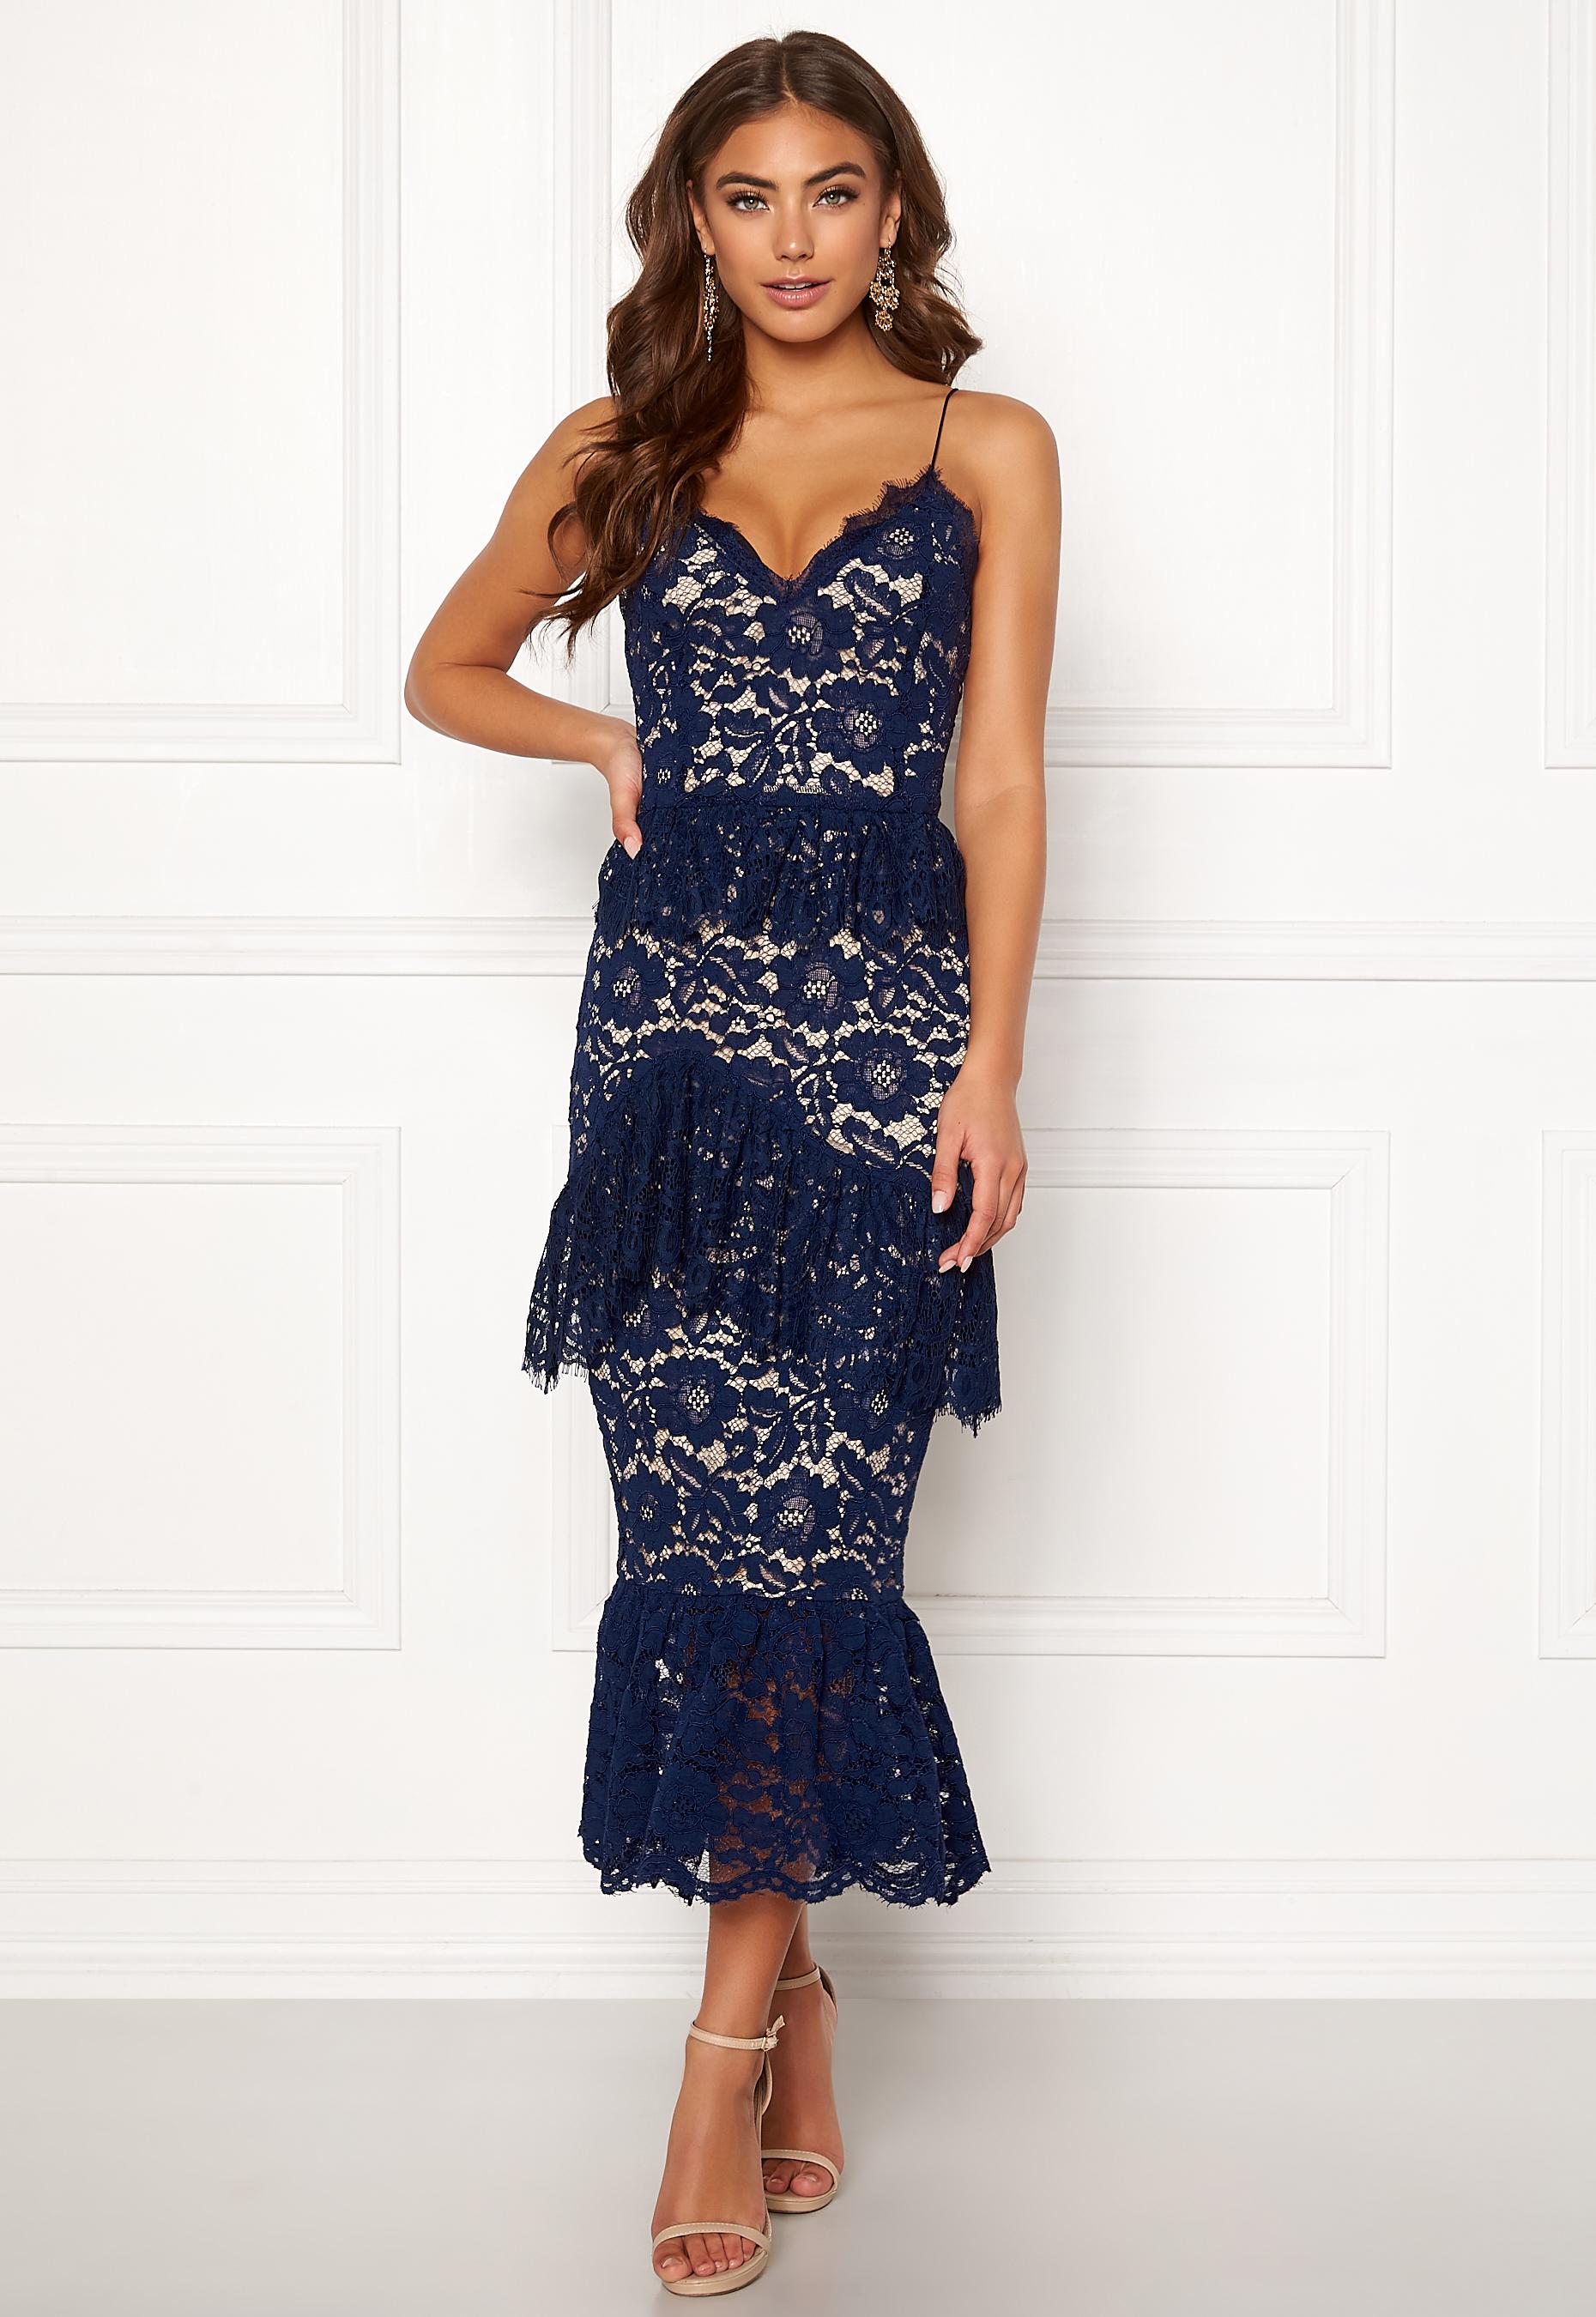 BUBBLEROOM Carolina Gynning flouncy lace dress Dark blue